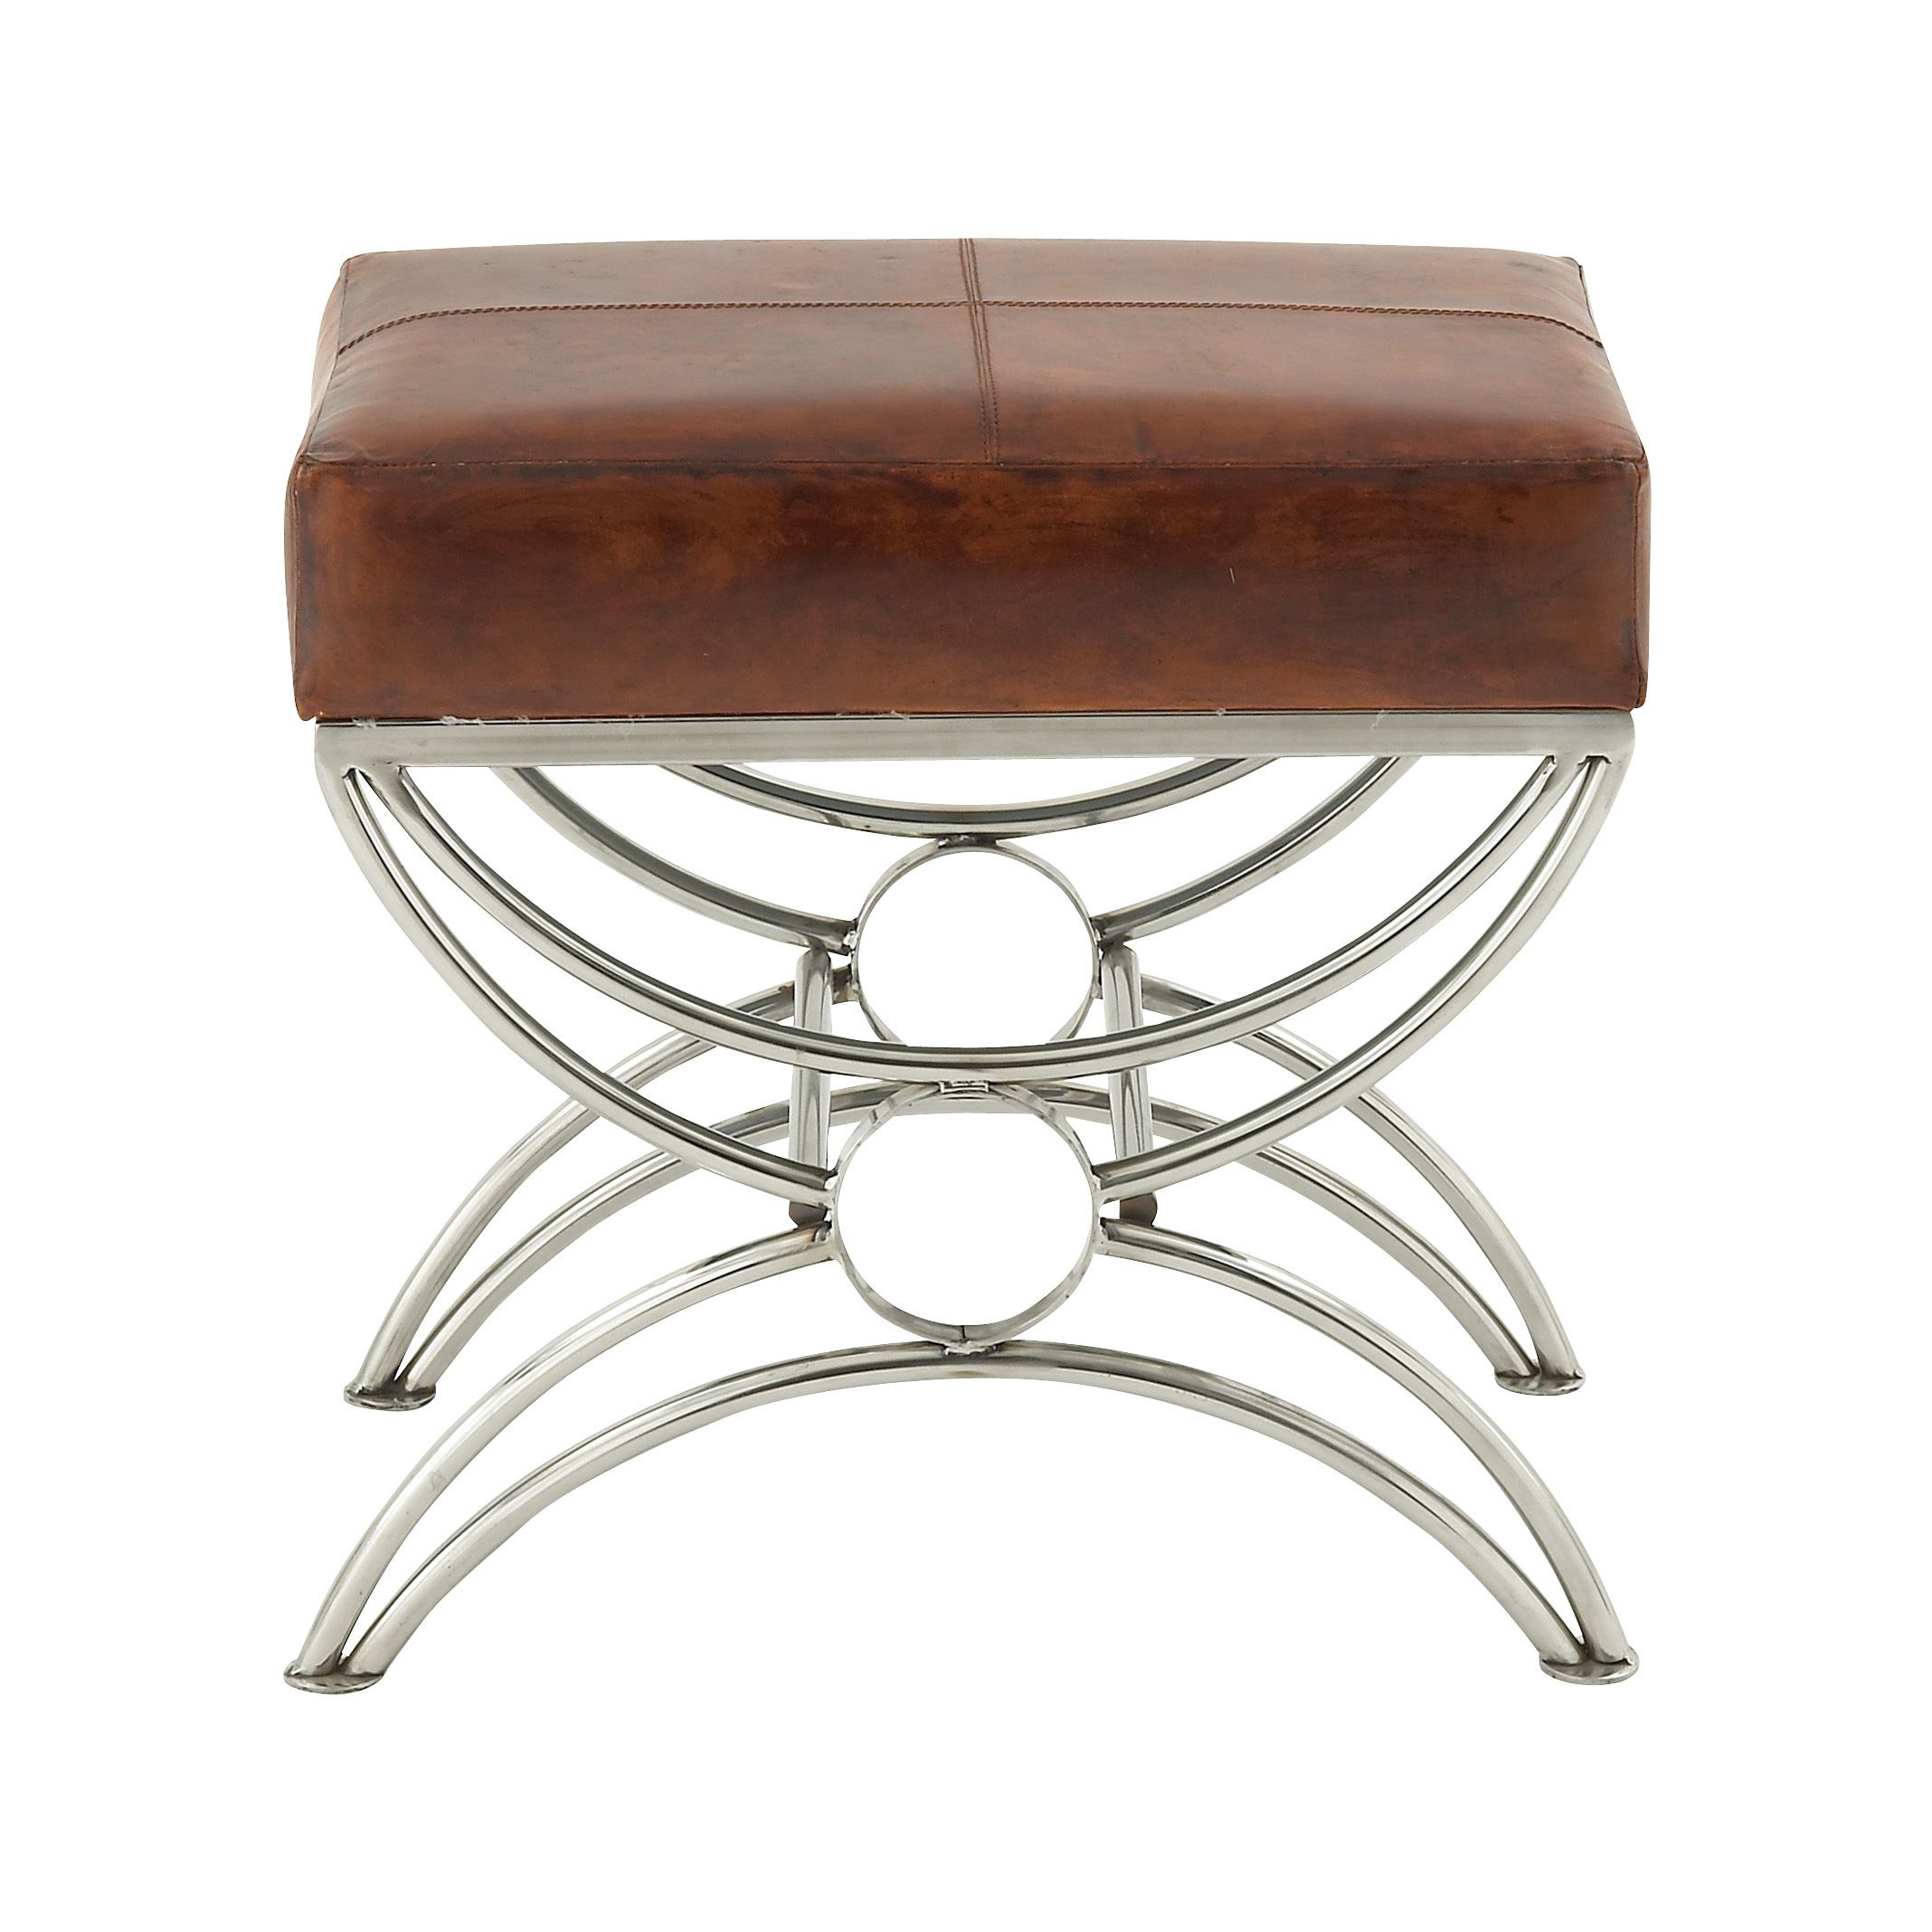 Steel leather foot stool adorable steel leather foot stool brown